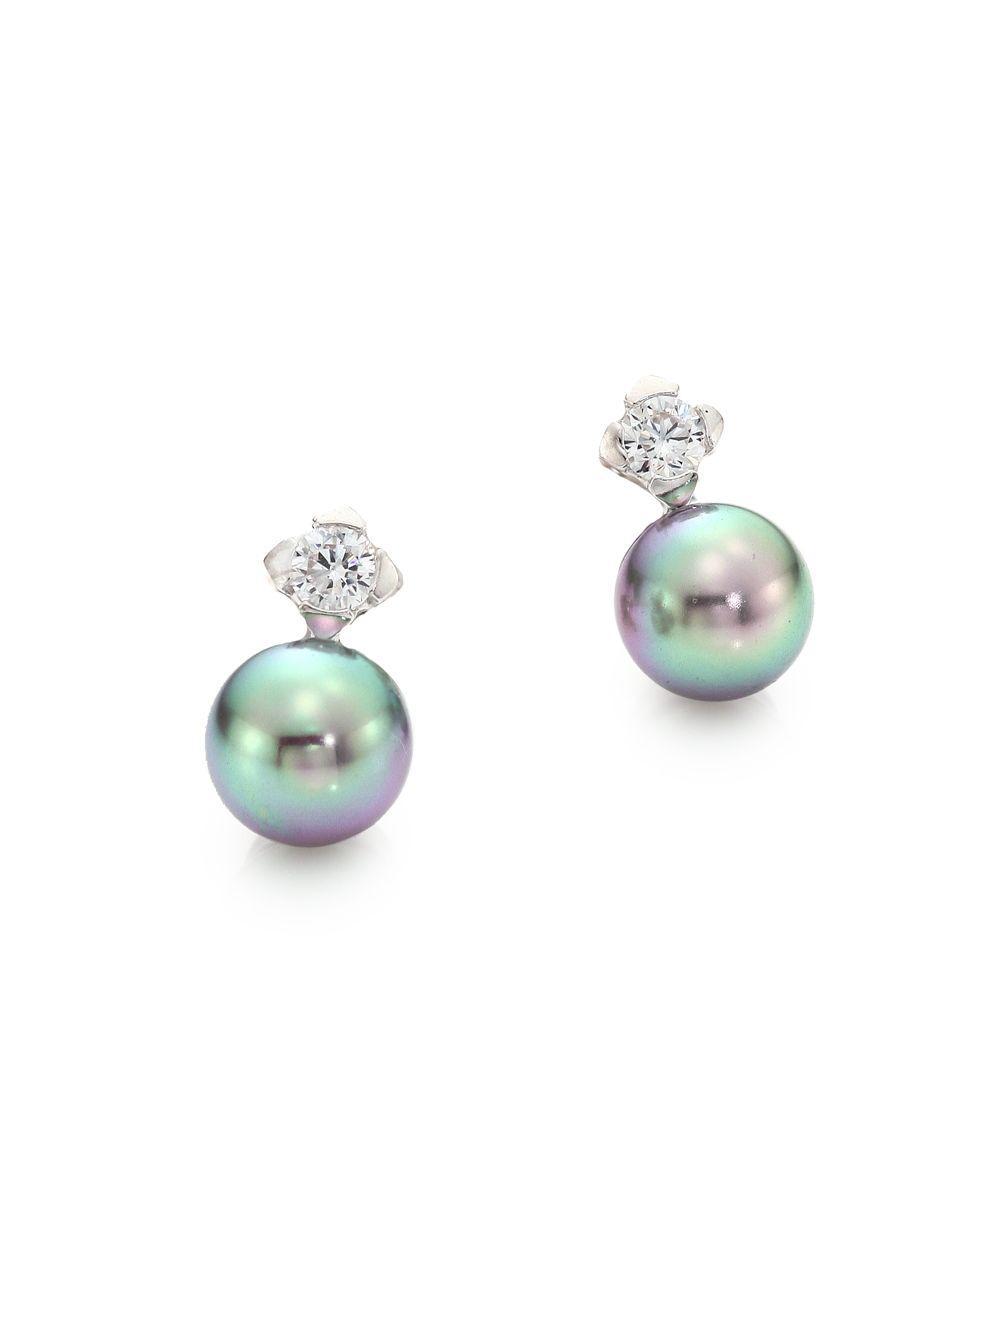 Majorica 7mm Simulated Pearl & Crystal Stud Earrings 86Itr9dmO